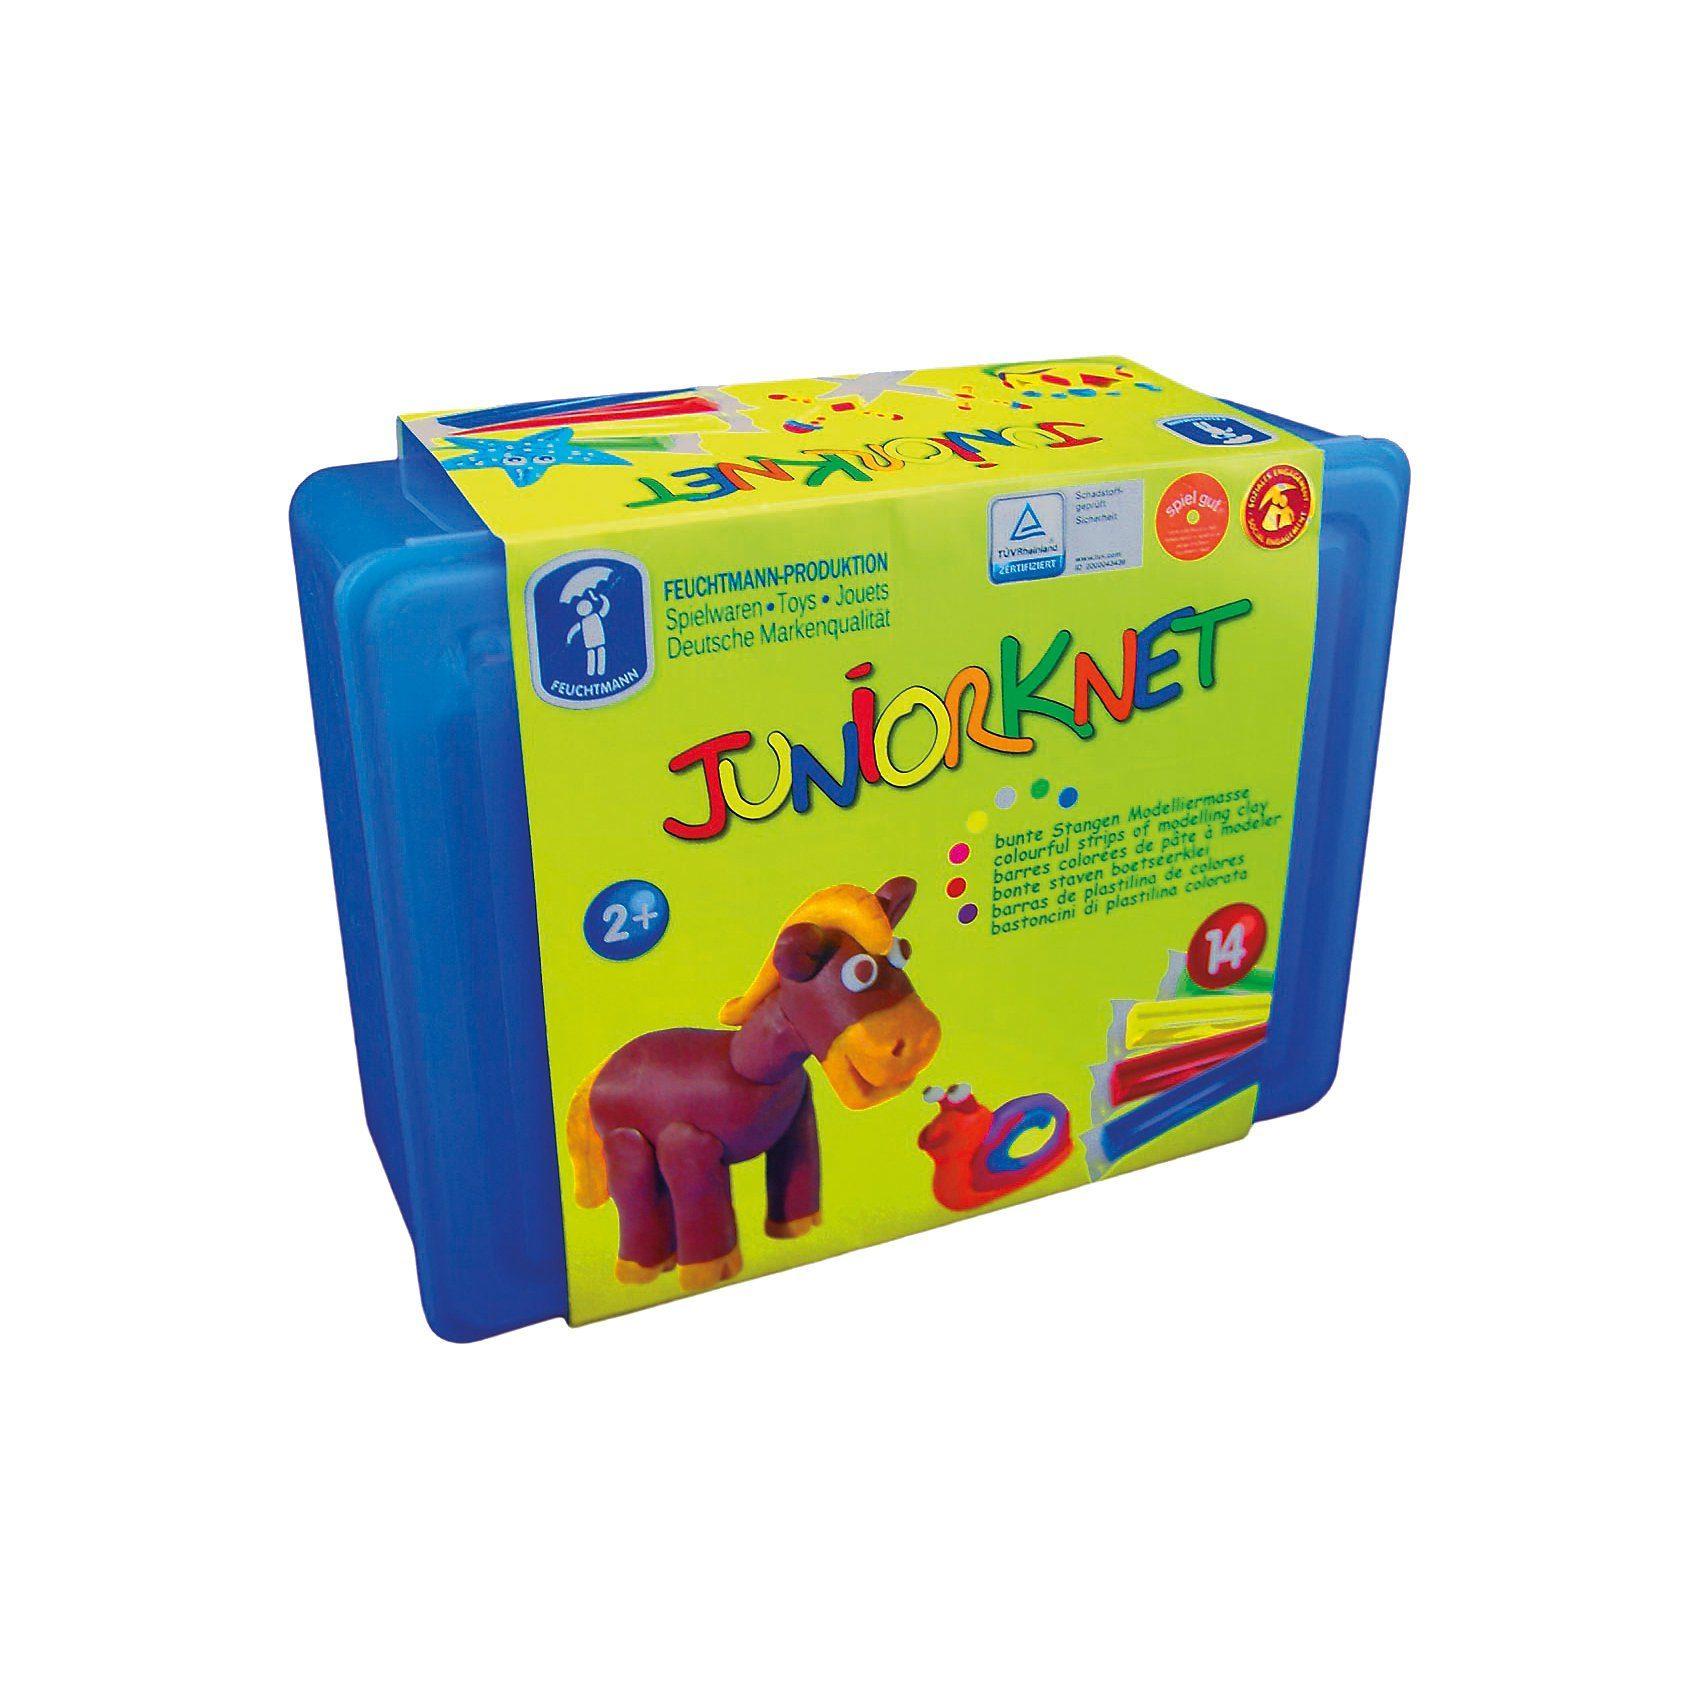 Feuchtmann Juniorknet One for Two Klickbox Maxi, 14 x 50 g